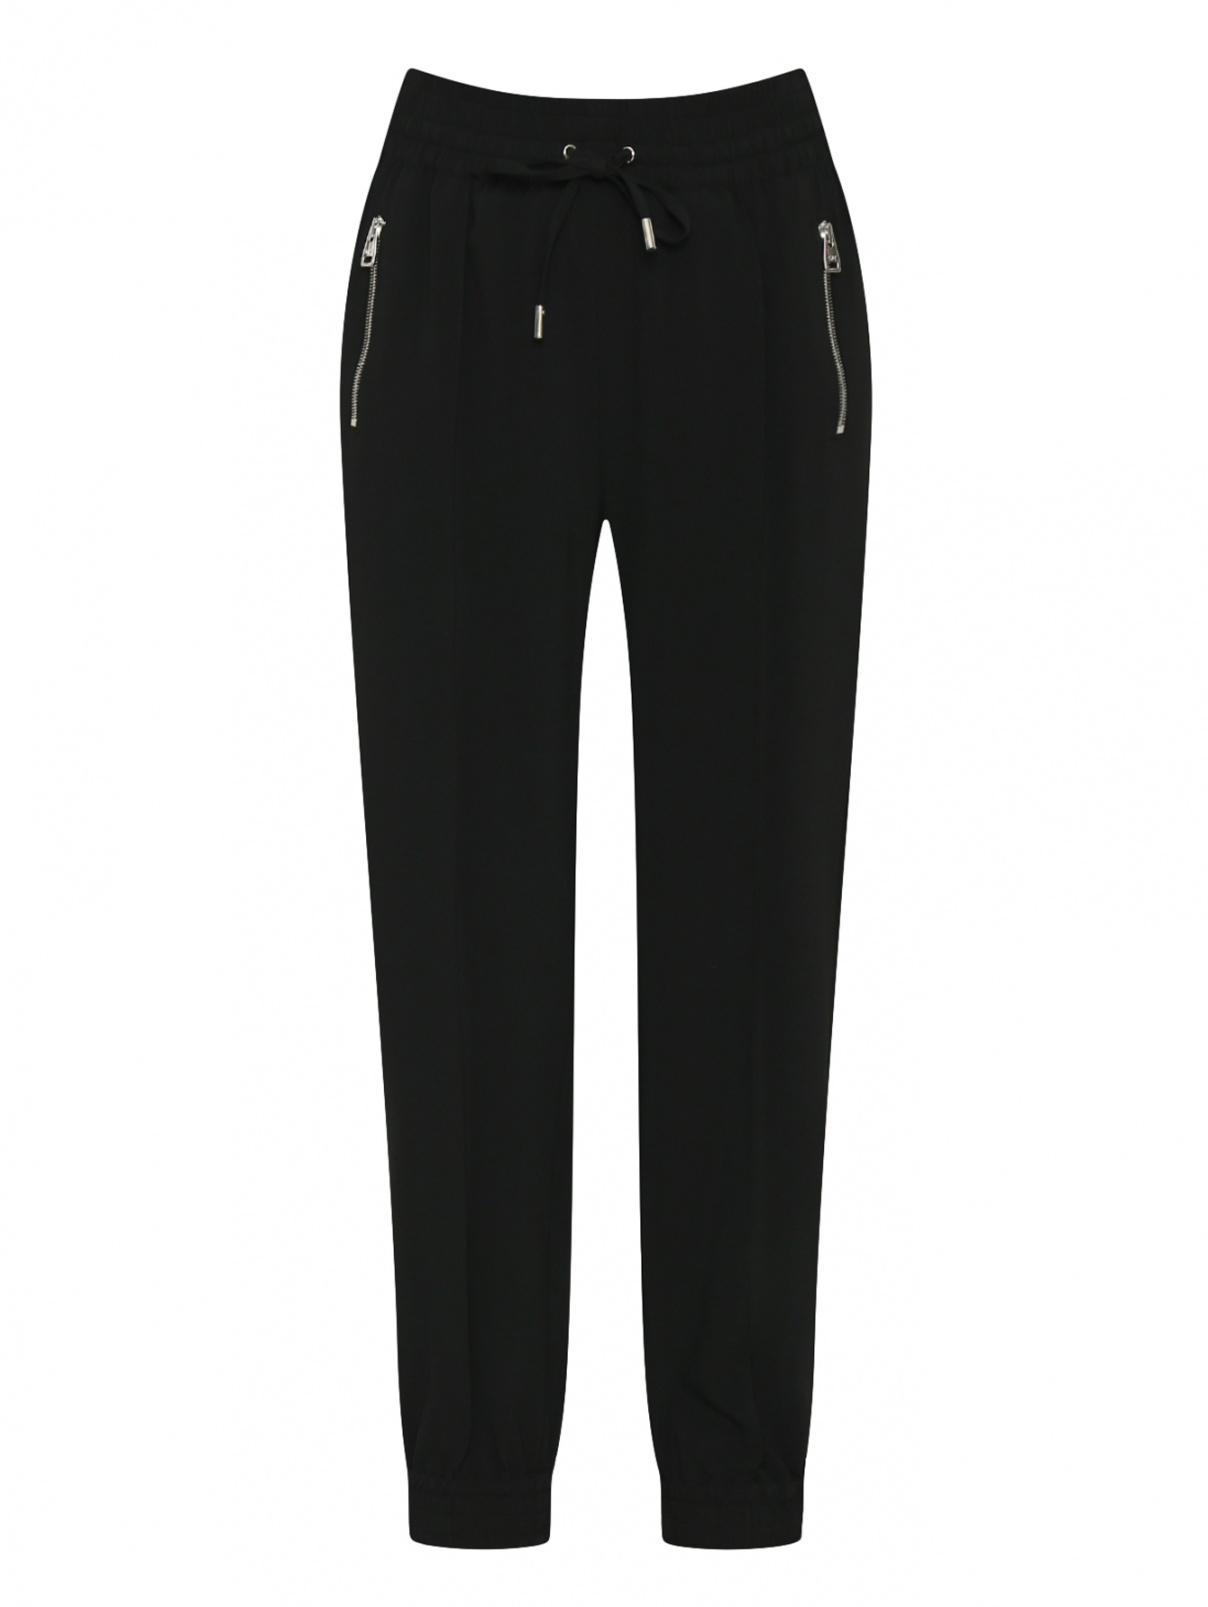 Трикотажные брюки на резинке Ermanno Scervino  –  Общий вид